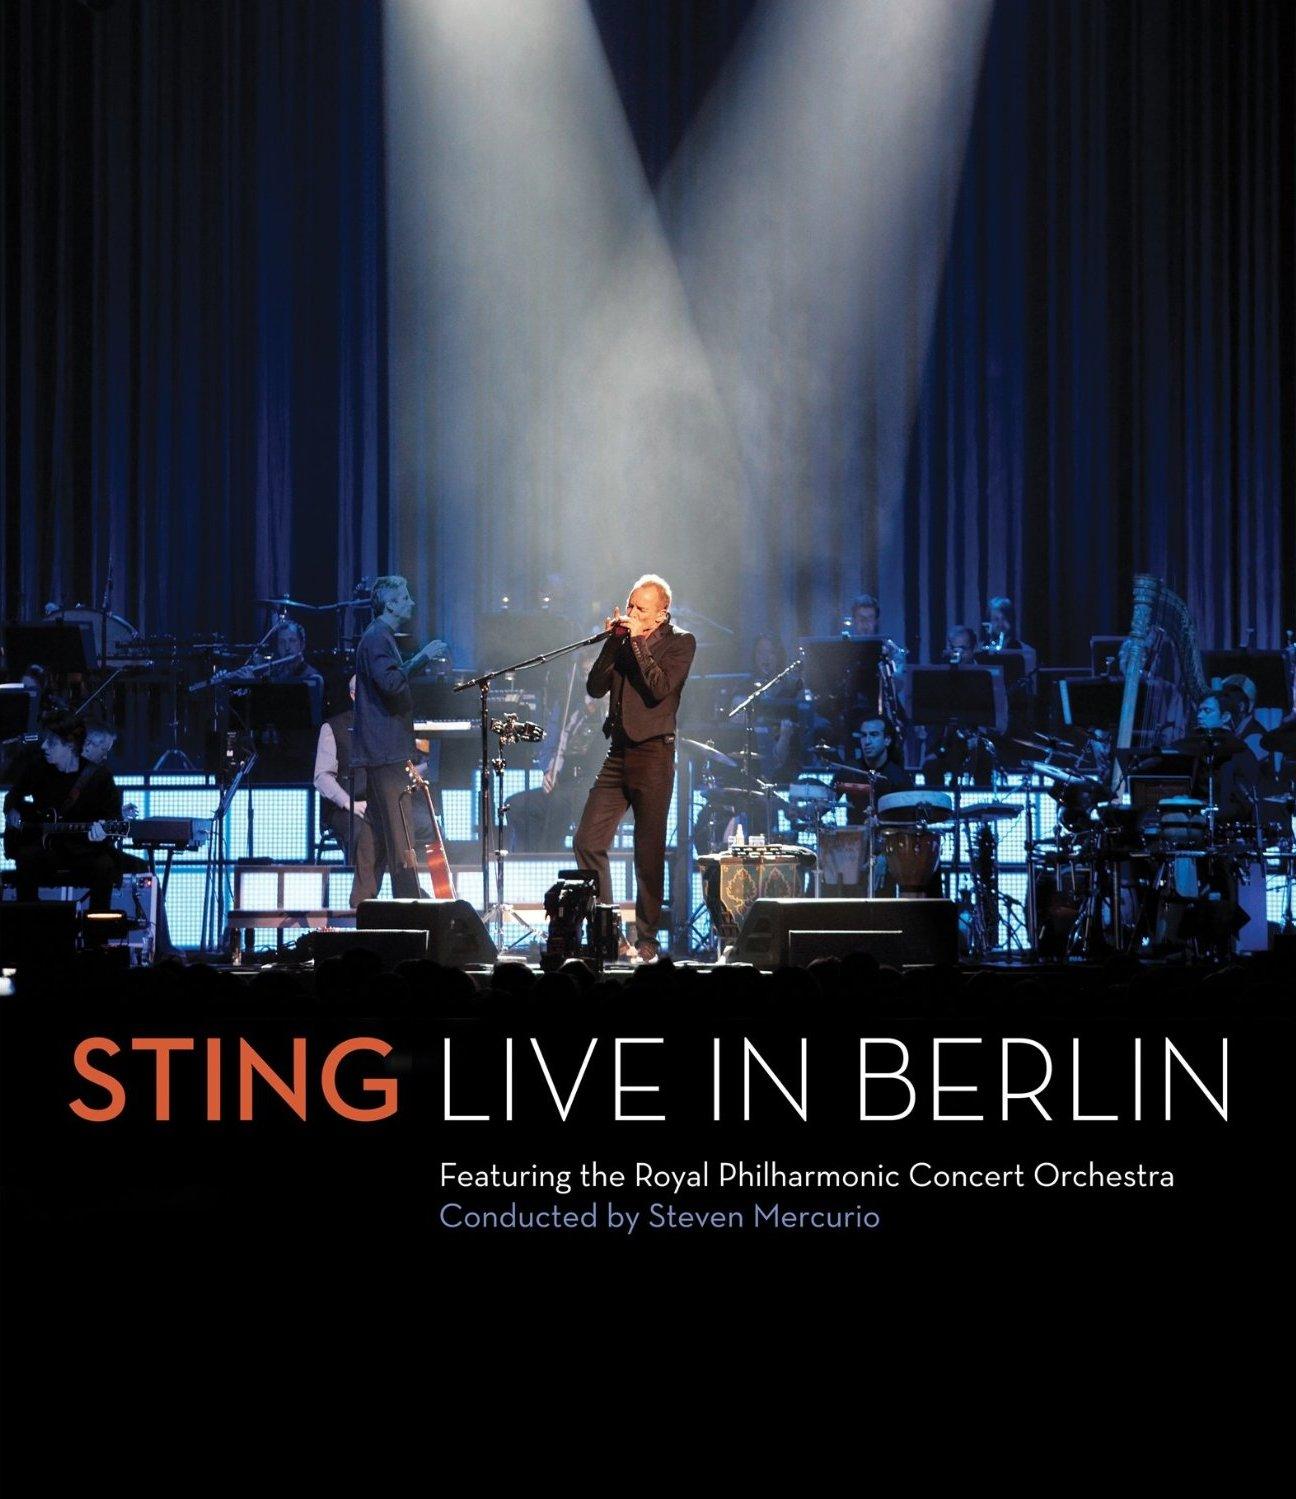 http://4.bp.blogspot.com/-Z_jB-6VGnEA/TcFqVylb7vI/AAAAAAAAAII/tpICDolmydc/s1600/sting+live+berlin.jpg